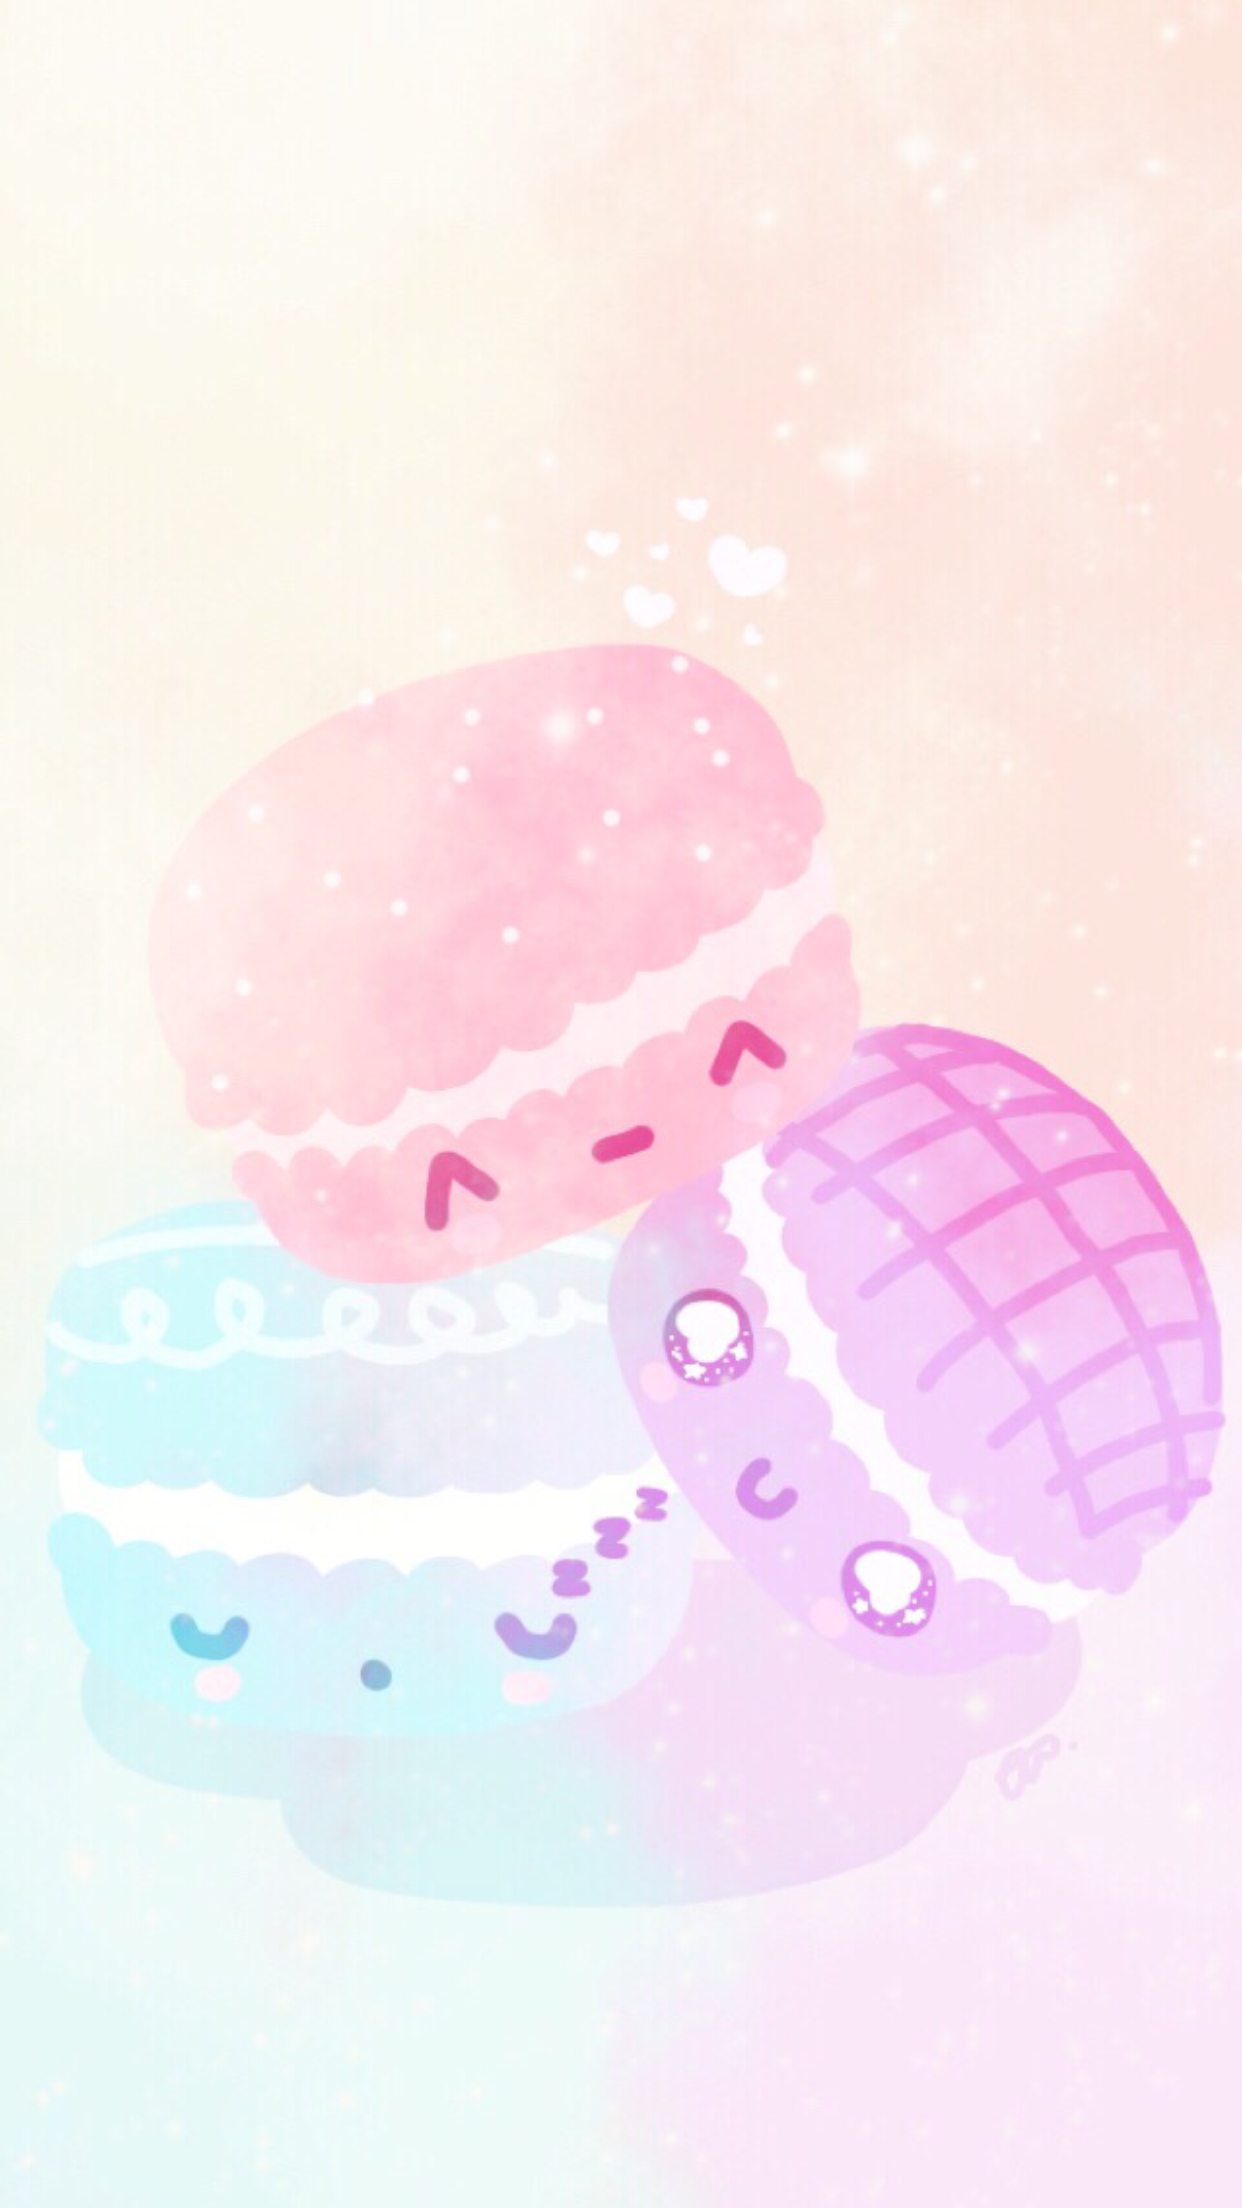 Pin by Areanna on Kawaii cuteness Kawaii wallpaper